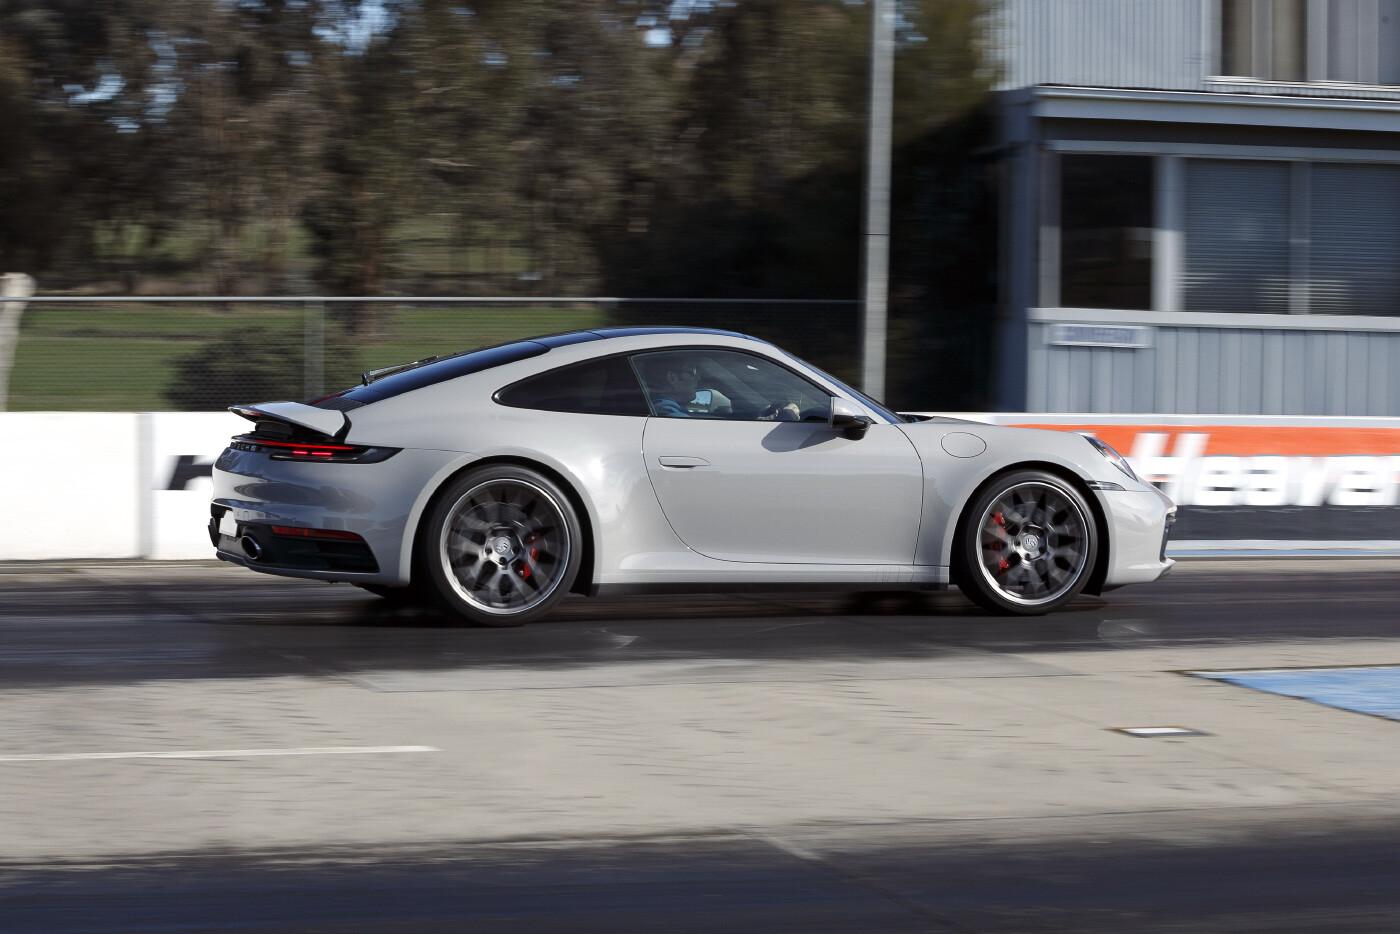 Porsche 911 C 4 Jpg